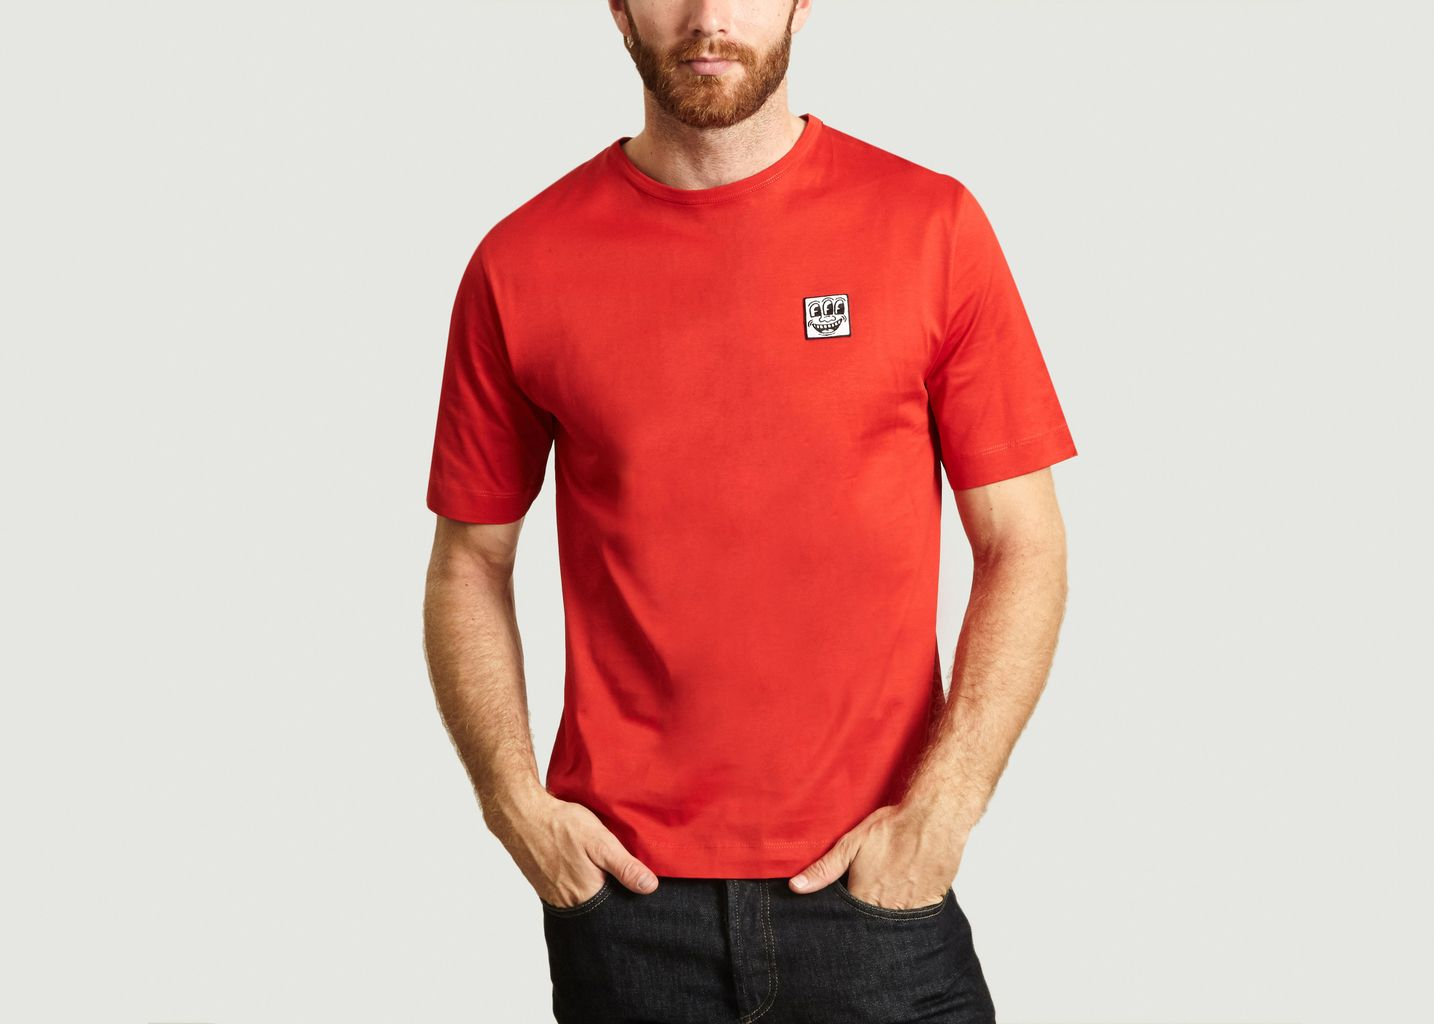 T-Shirt Unity Patch x Keith Haring - Études